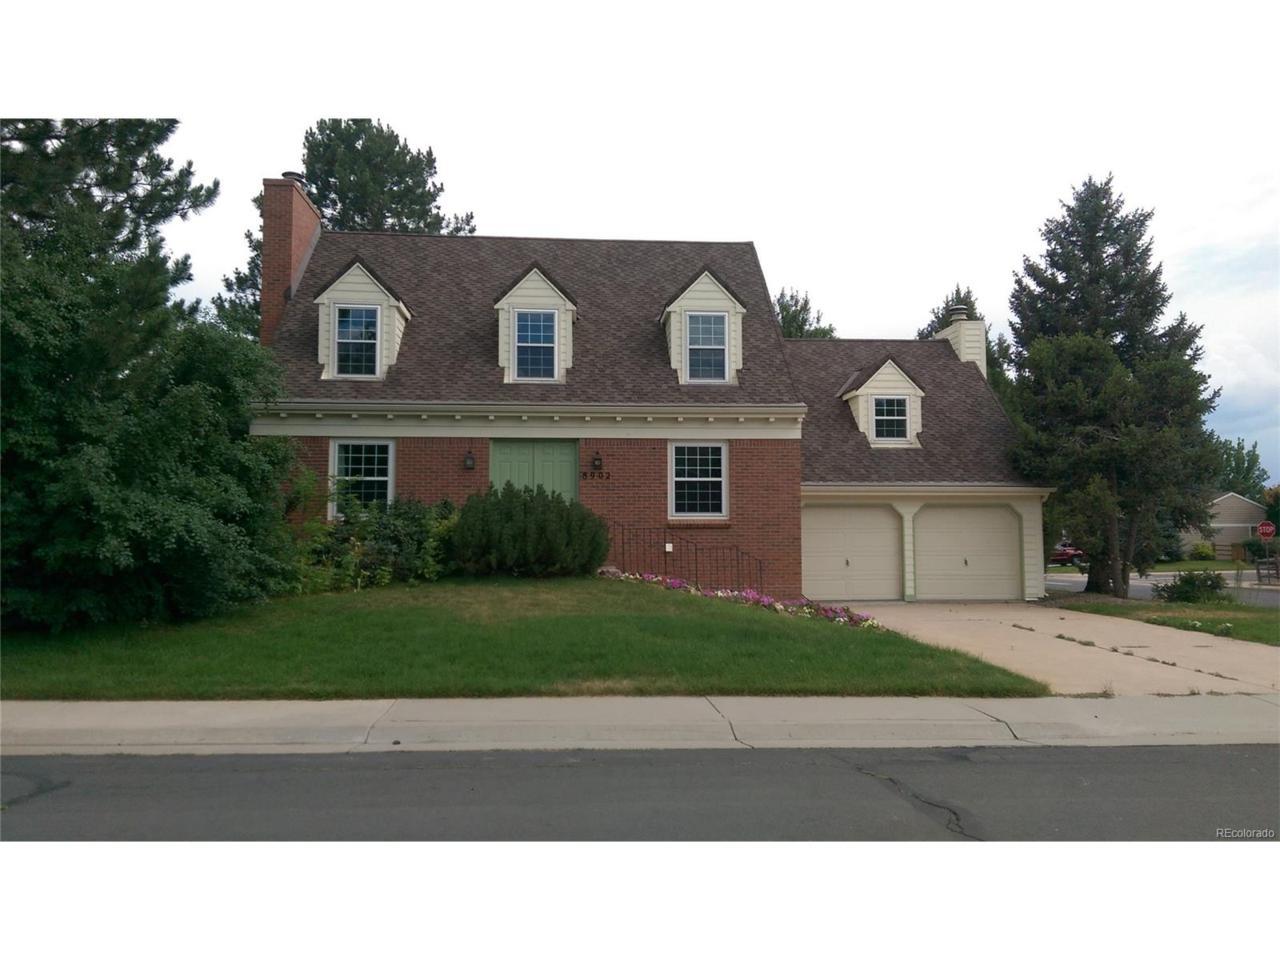 8902 W Progress Place, Littleton, CO 80123 (MLS #8393232) :: 8z Real Estate